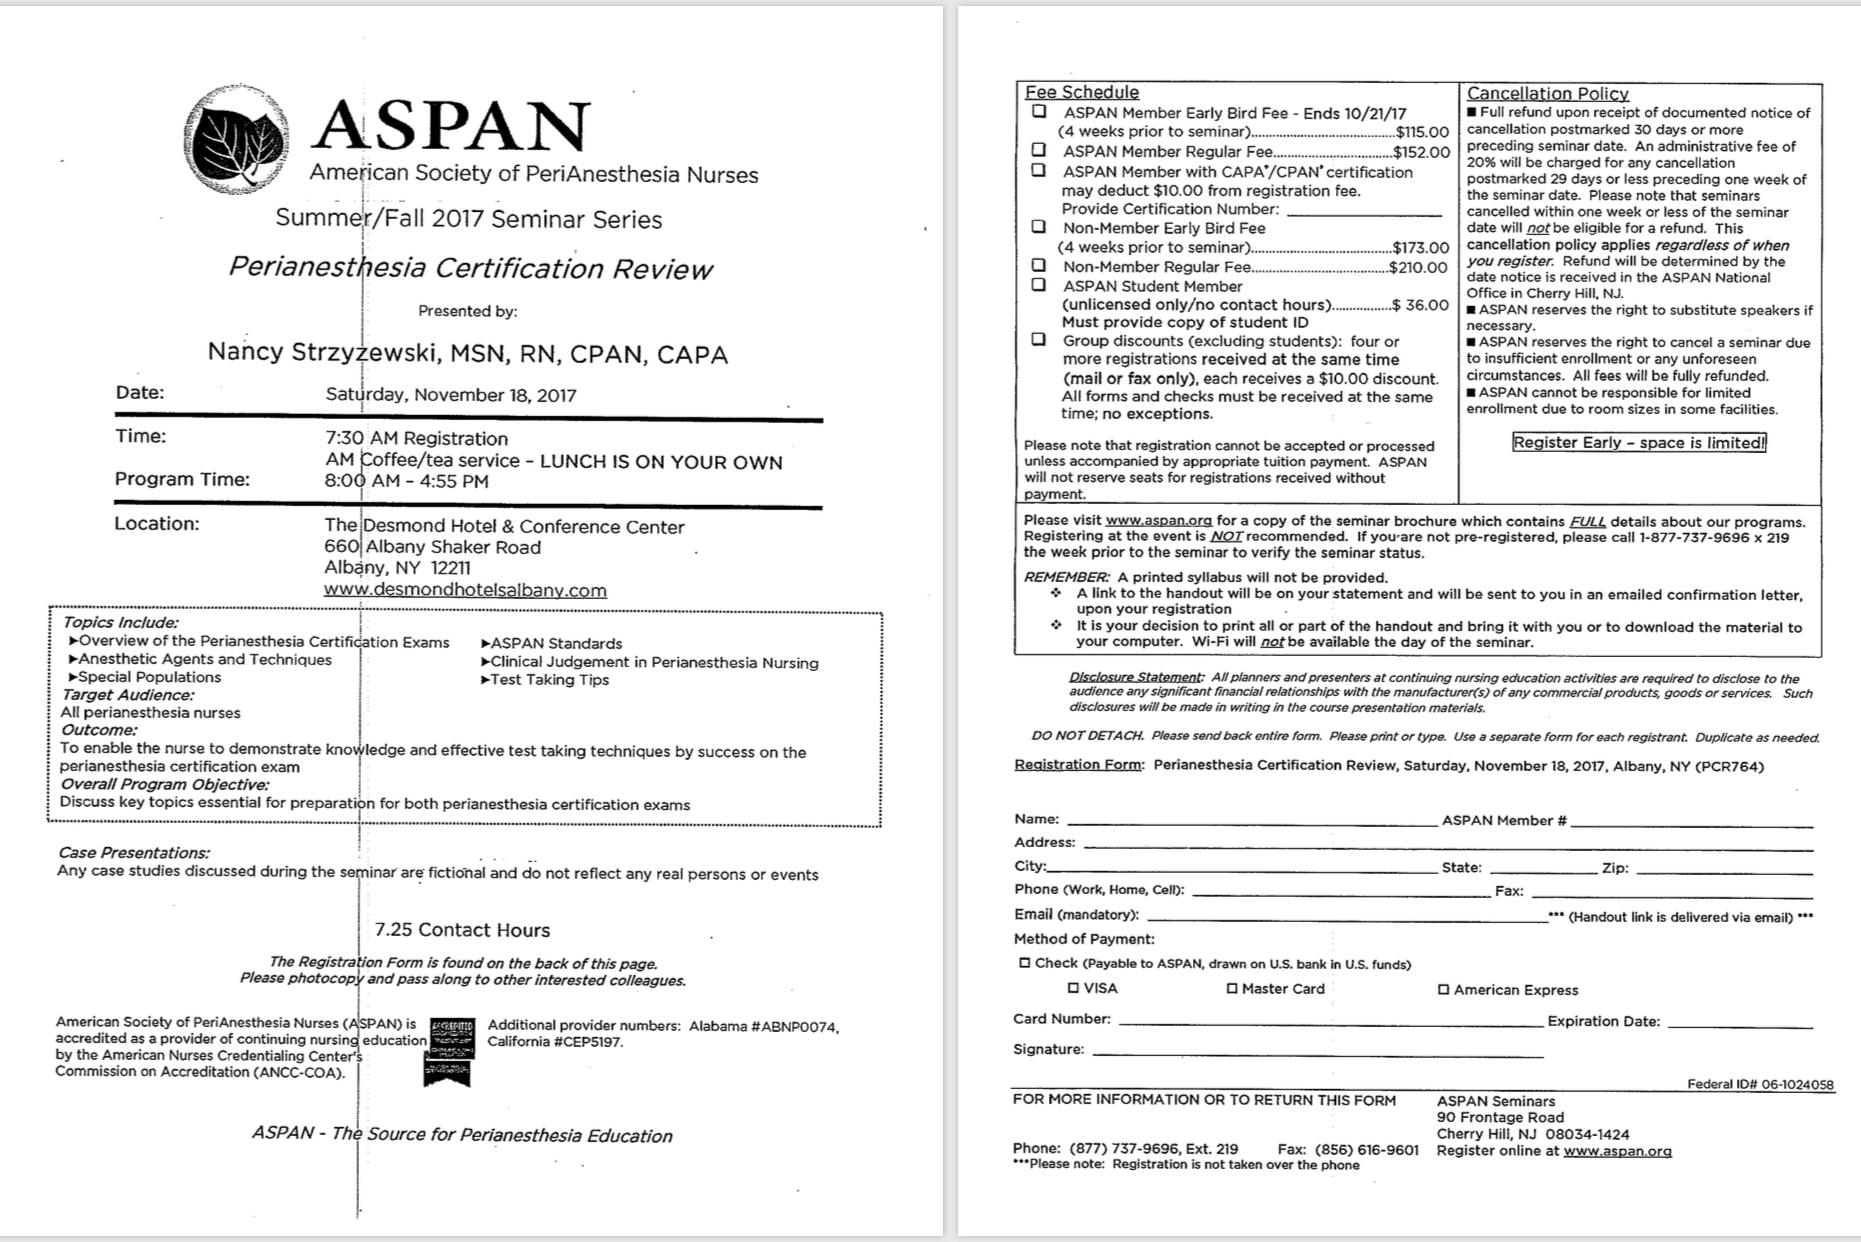 Nyspana Aspan Perianesthesia Certification Review